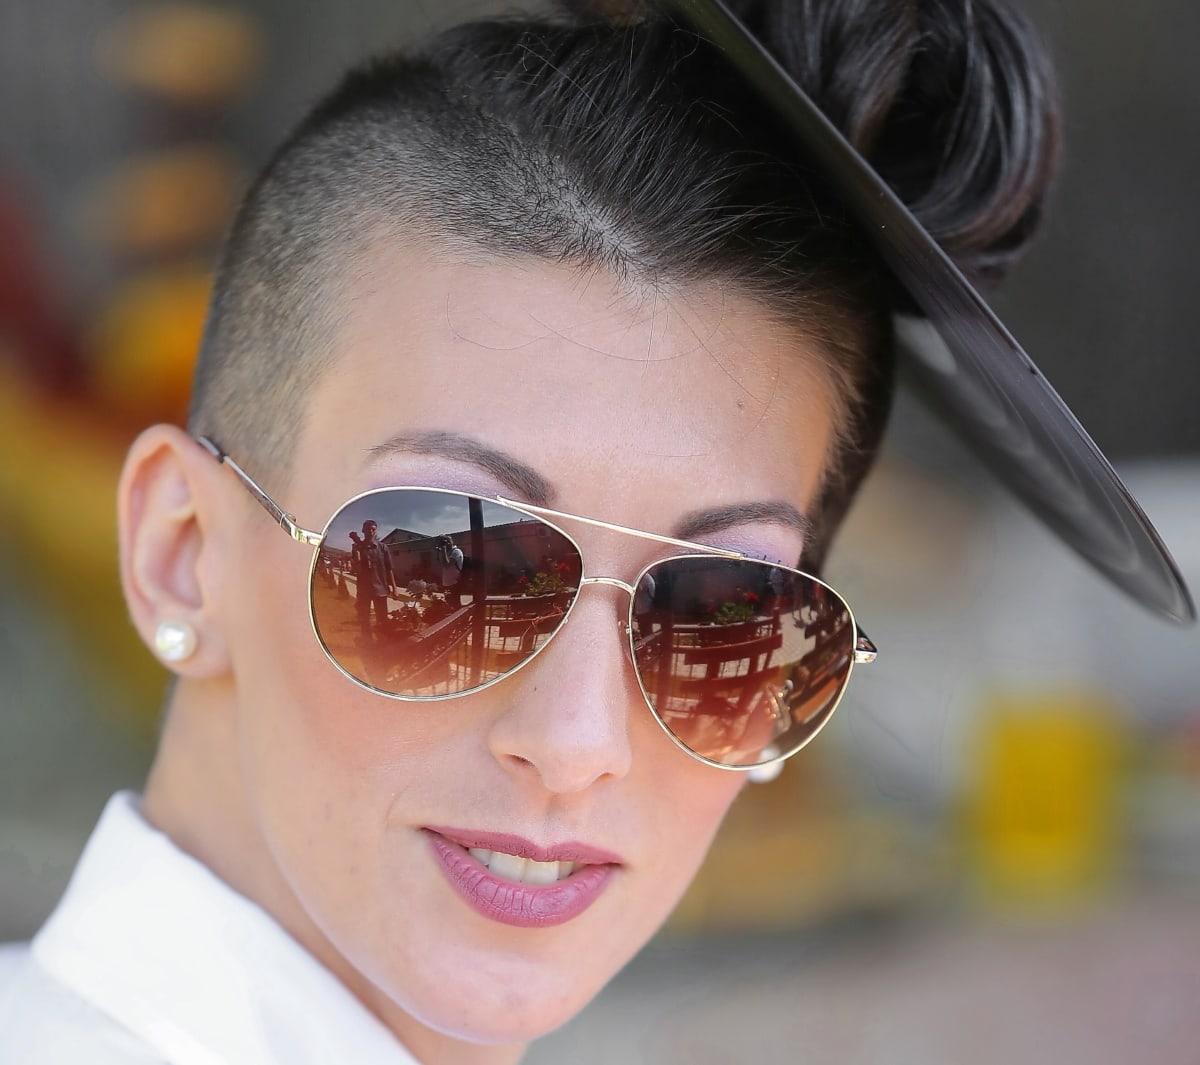 sunglasses, hairstyle, vinyl, head, fashion, portrait, glamour, pretty girl, face, glasses